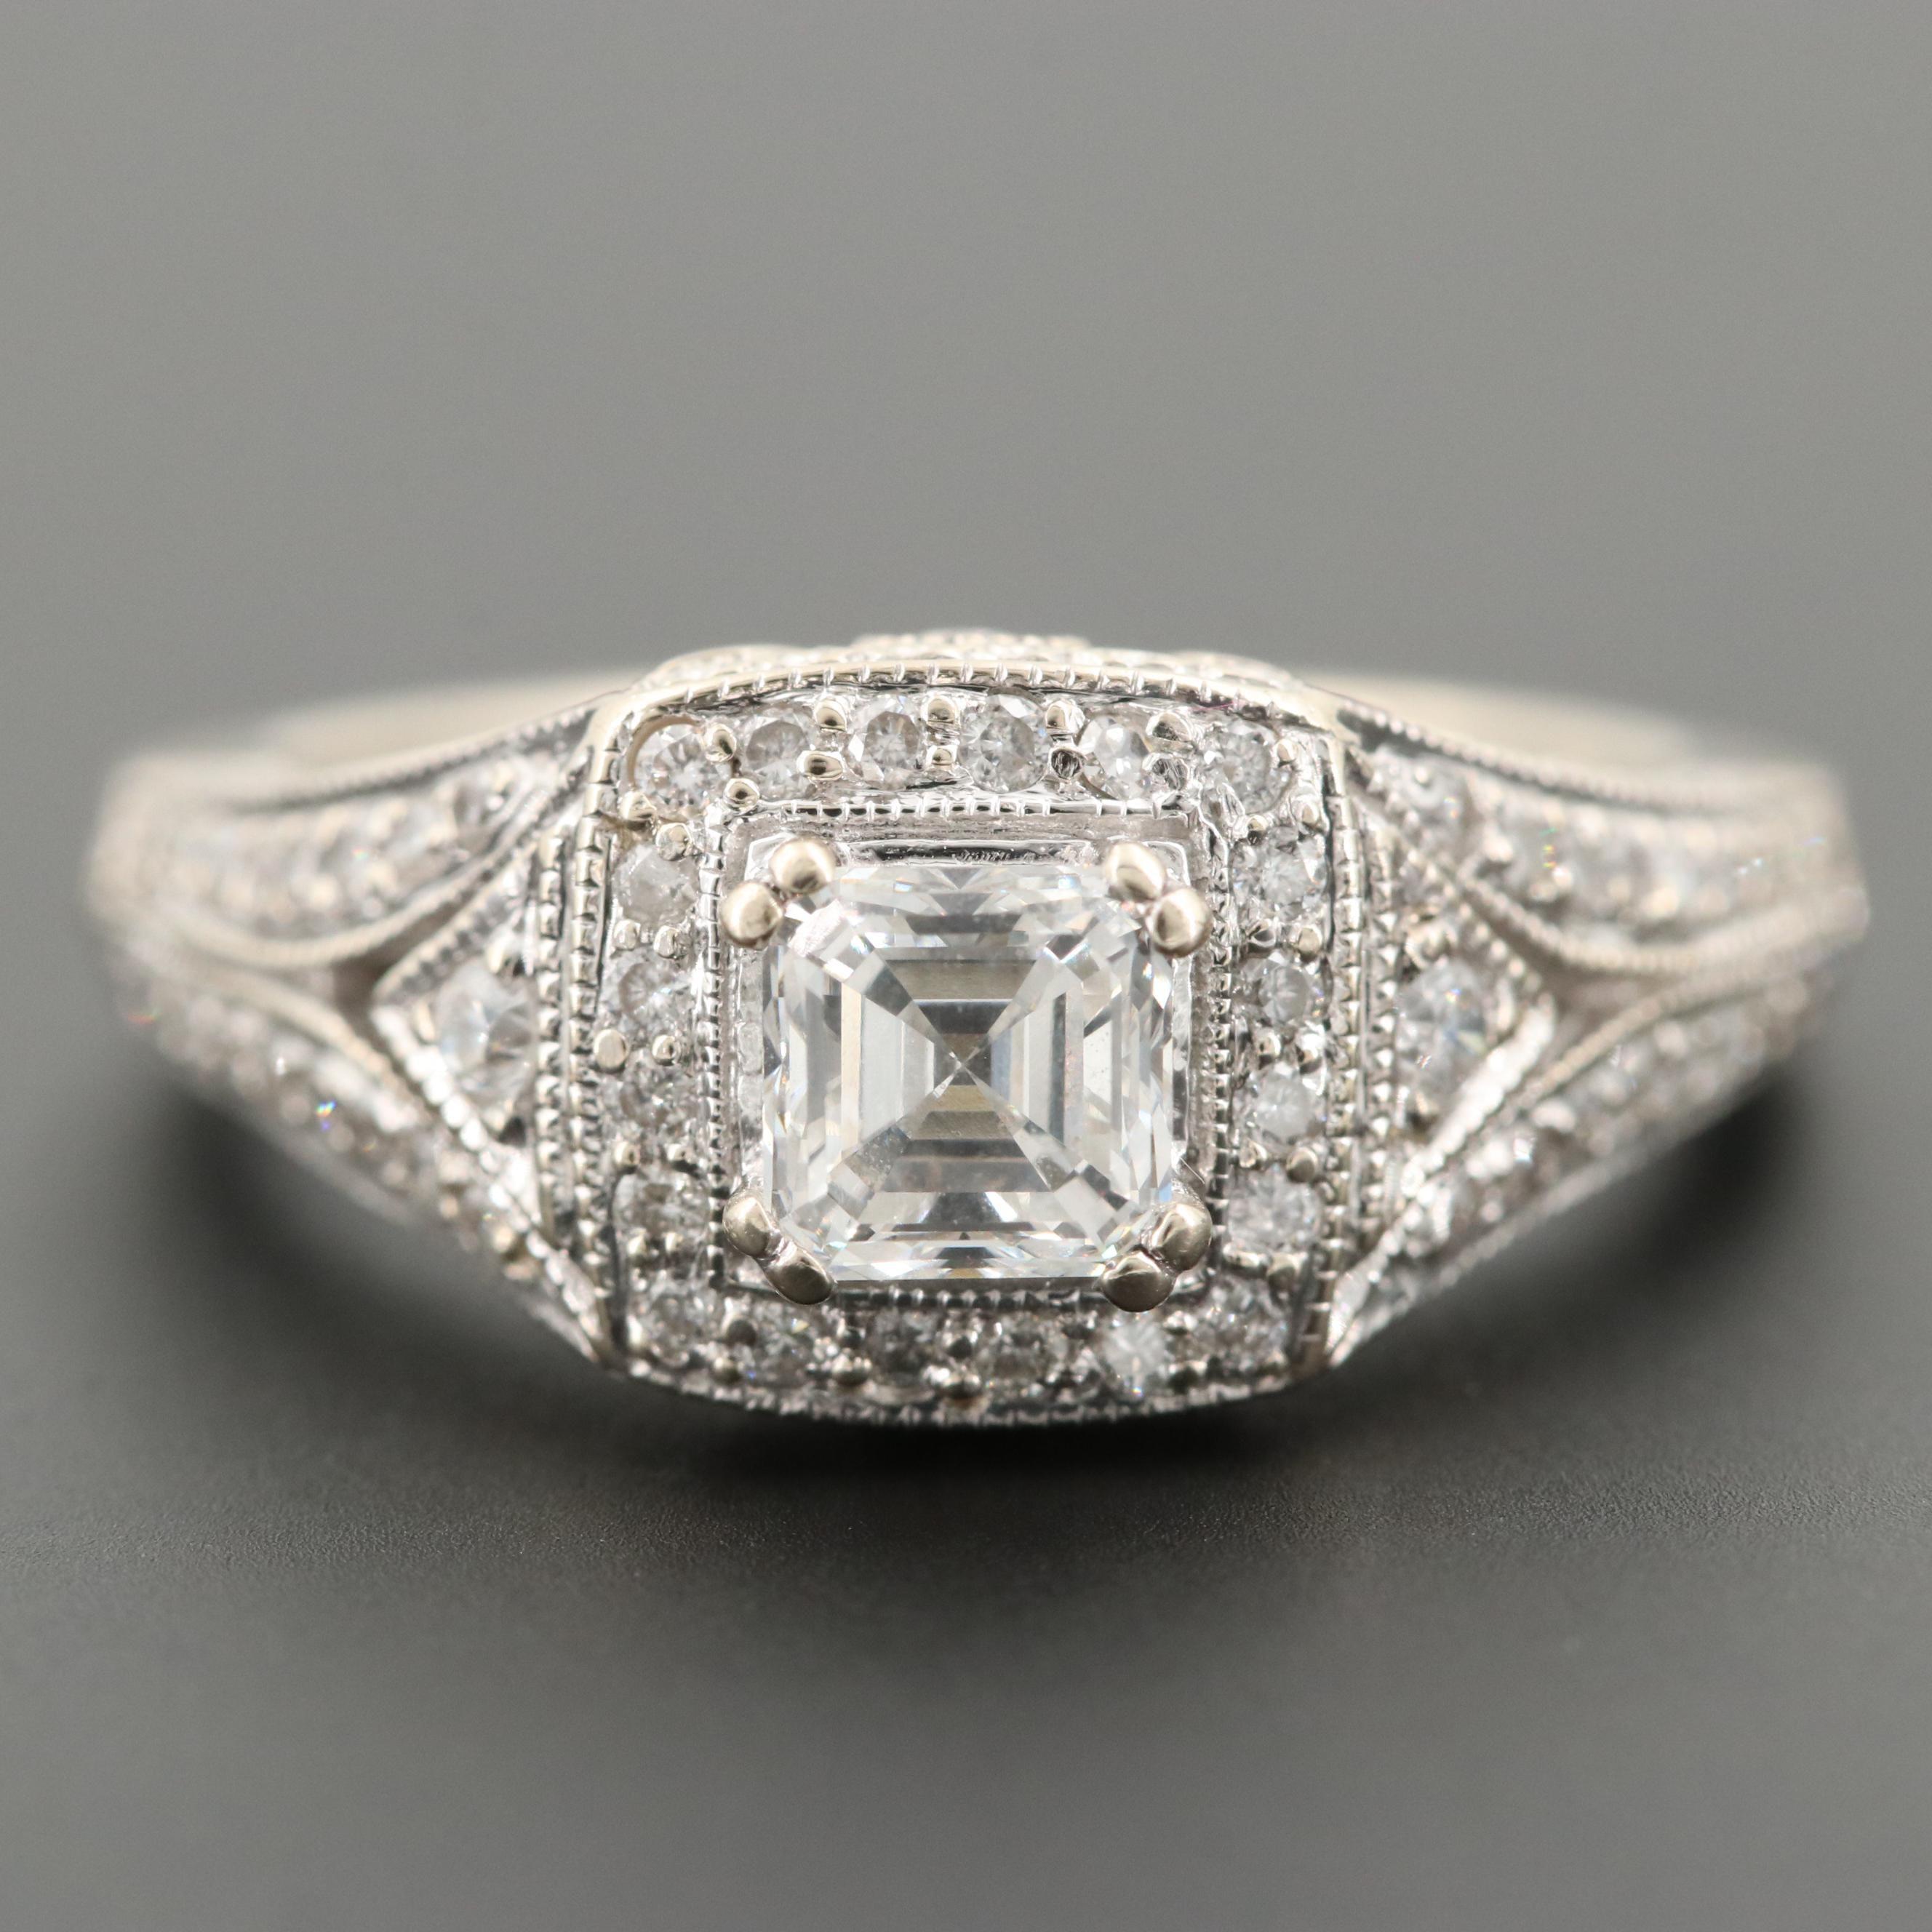 14K White Gold 1.16 CTW Diamond Ring